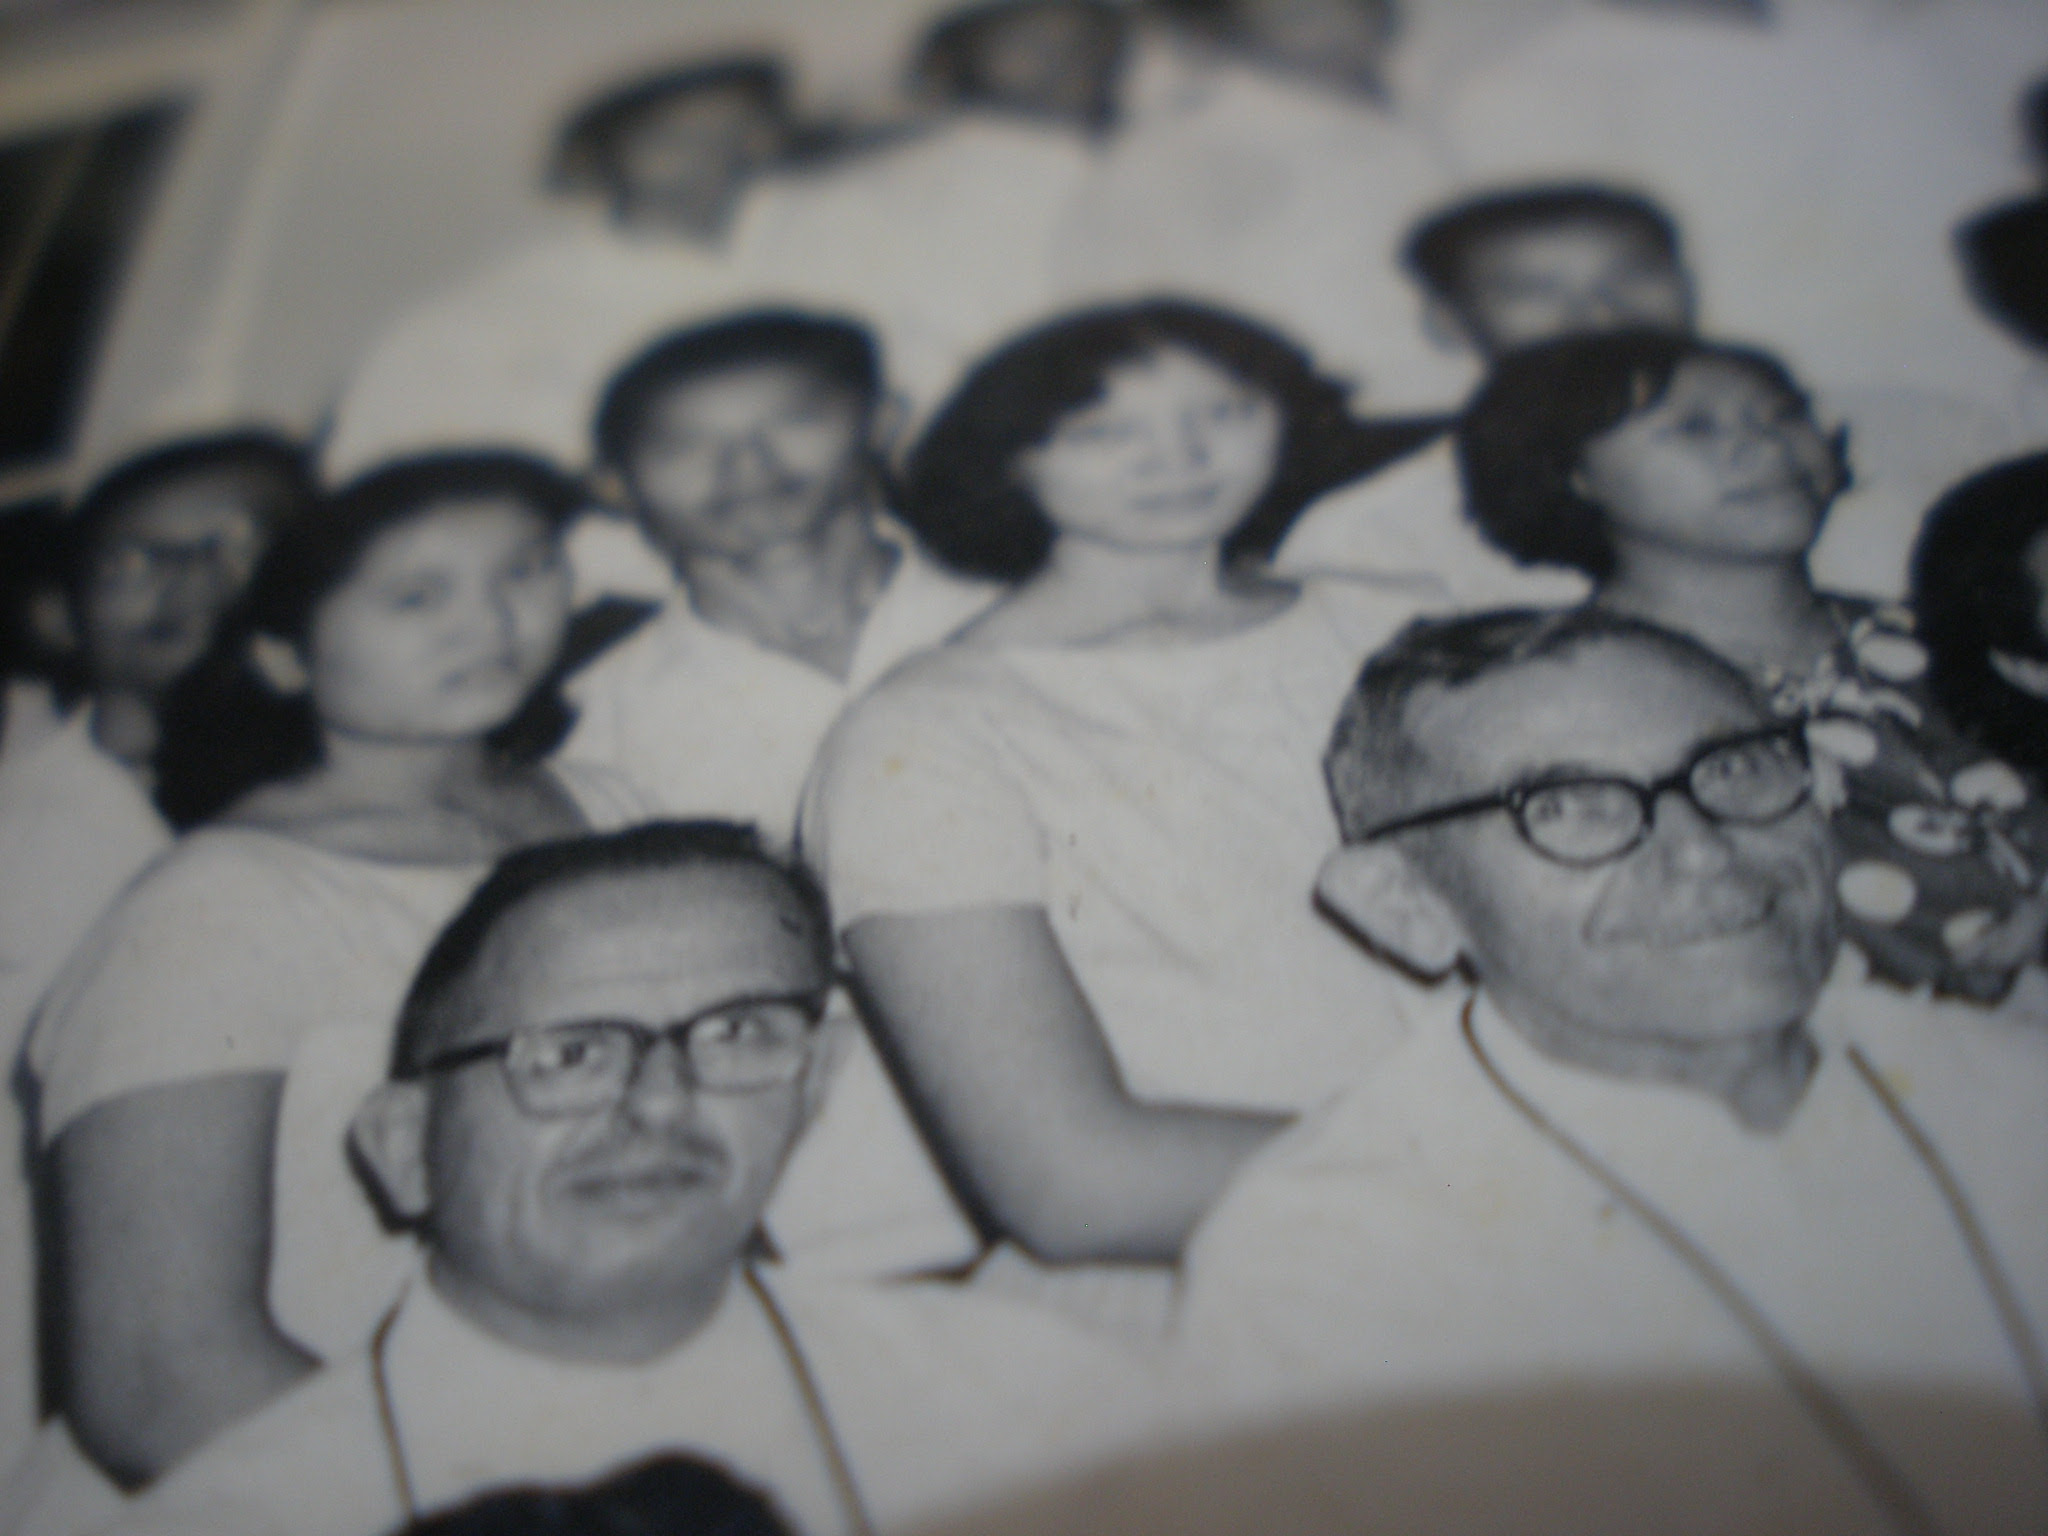 KOLEKSI SEJARAH INDONESIA 1945 BERSAMBUNG Driwancybermuseums Blog